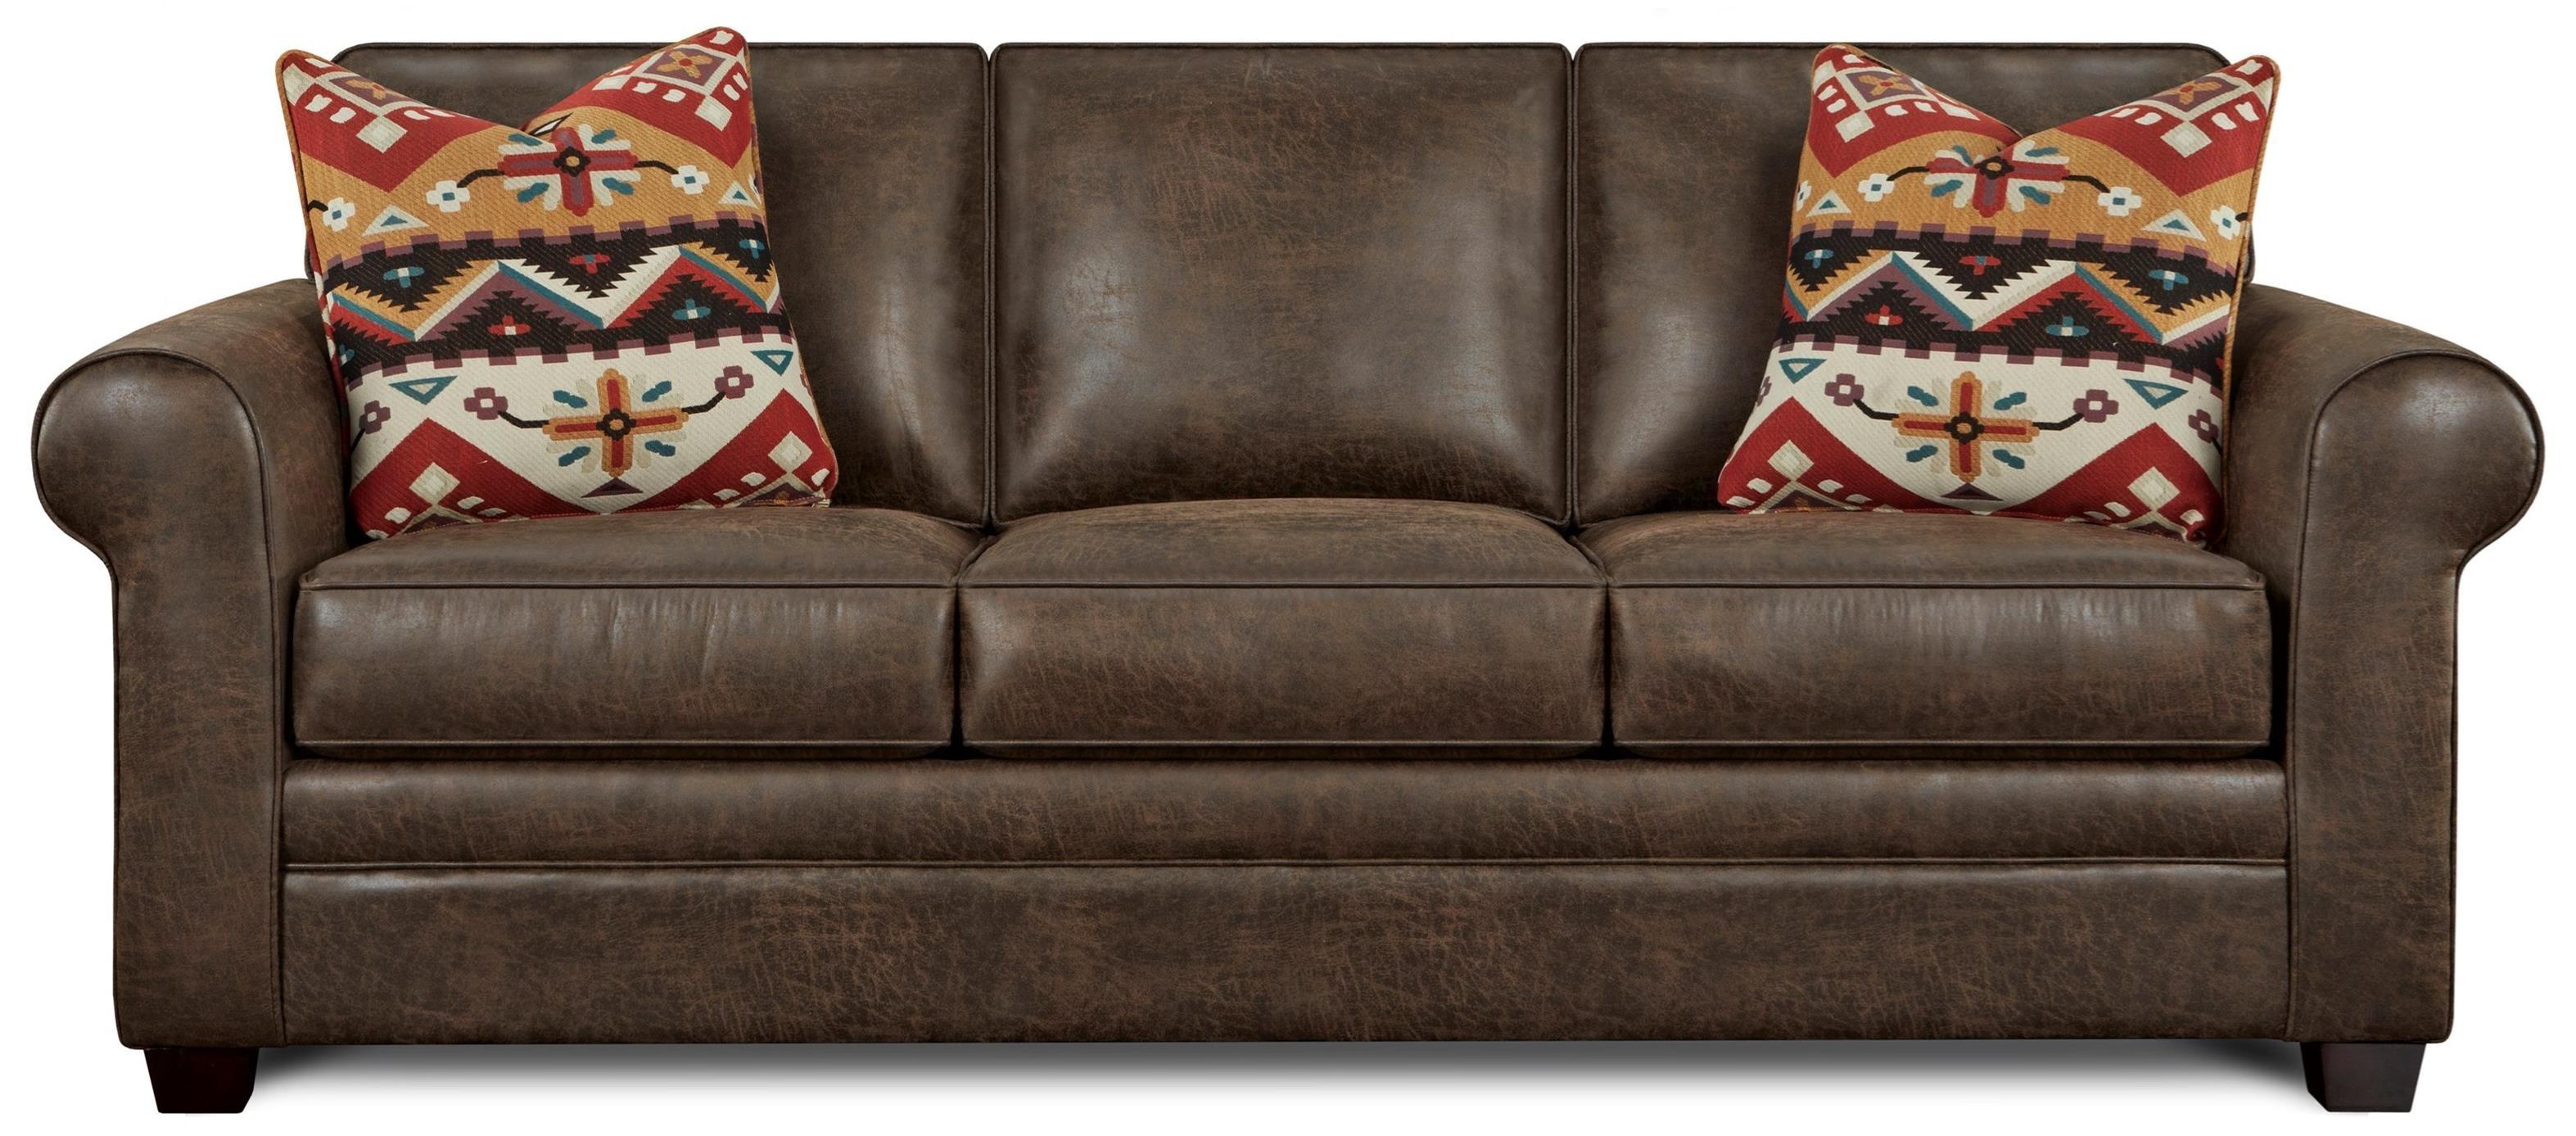 Fusion Furniture Sleeper Program Faux Leather Queen Sleeper